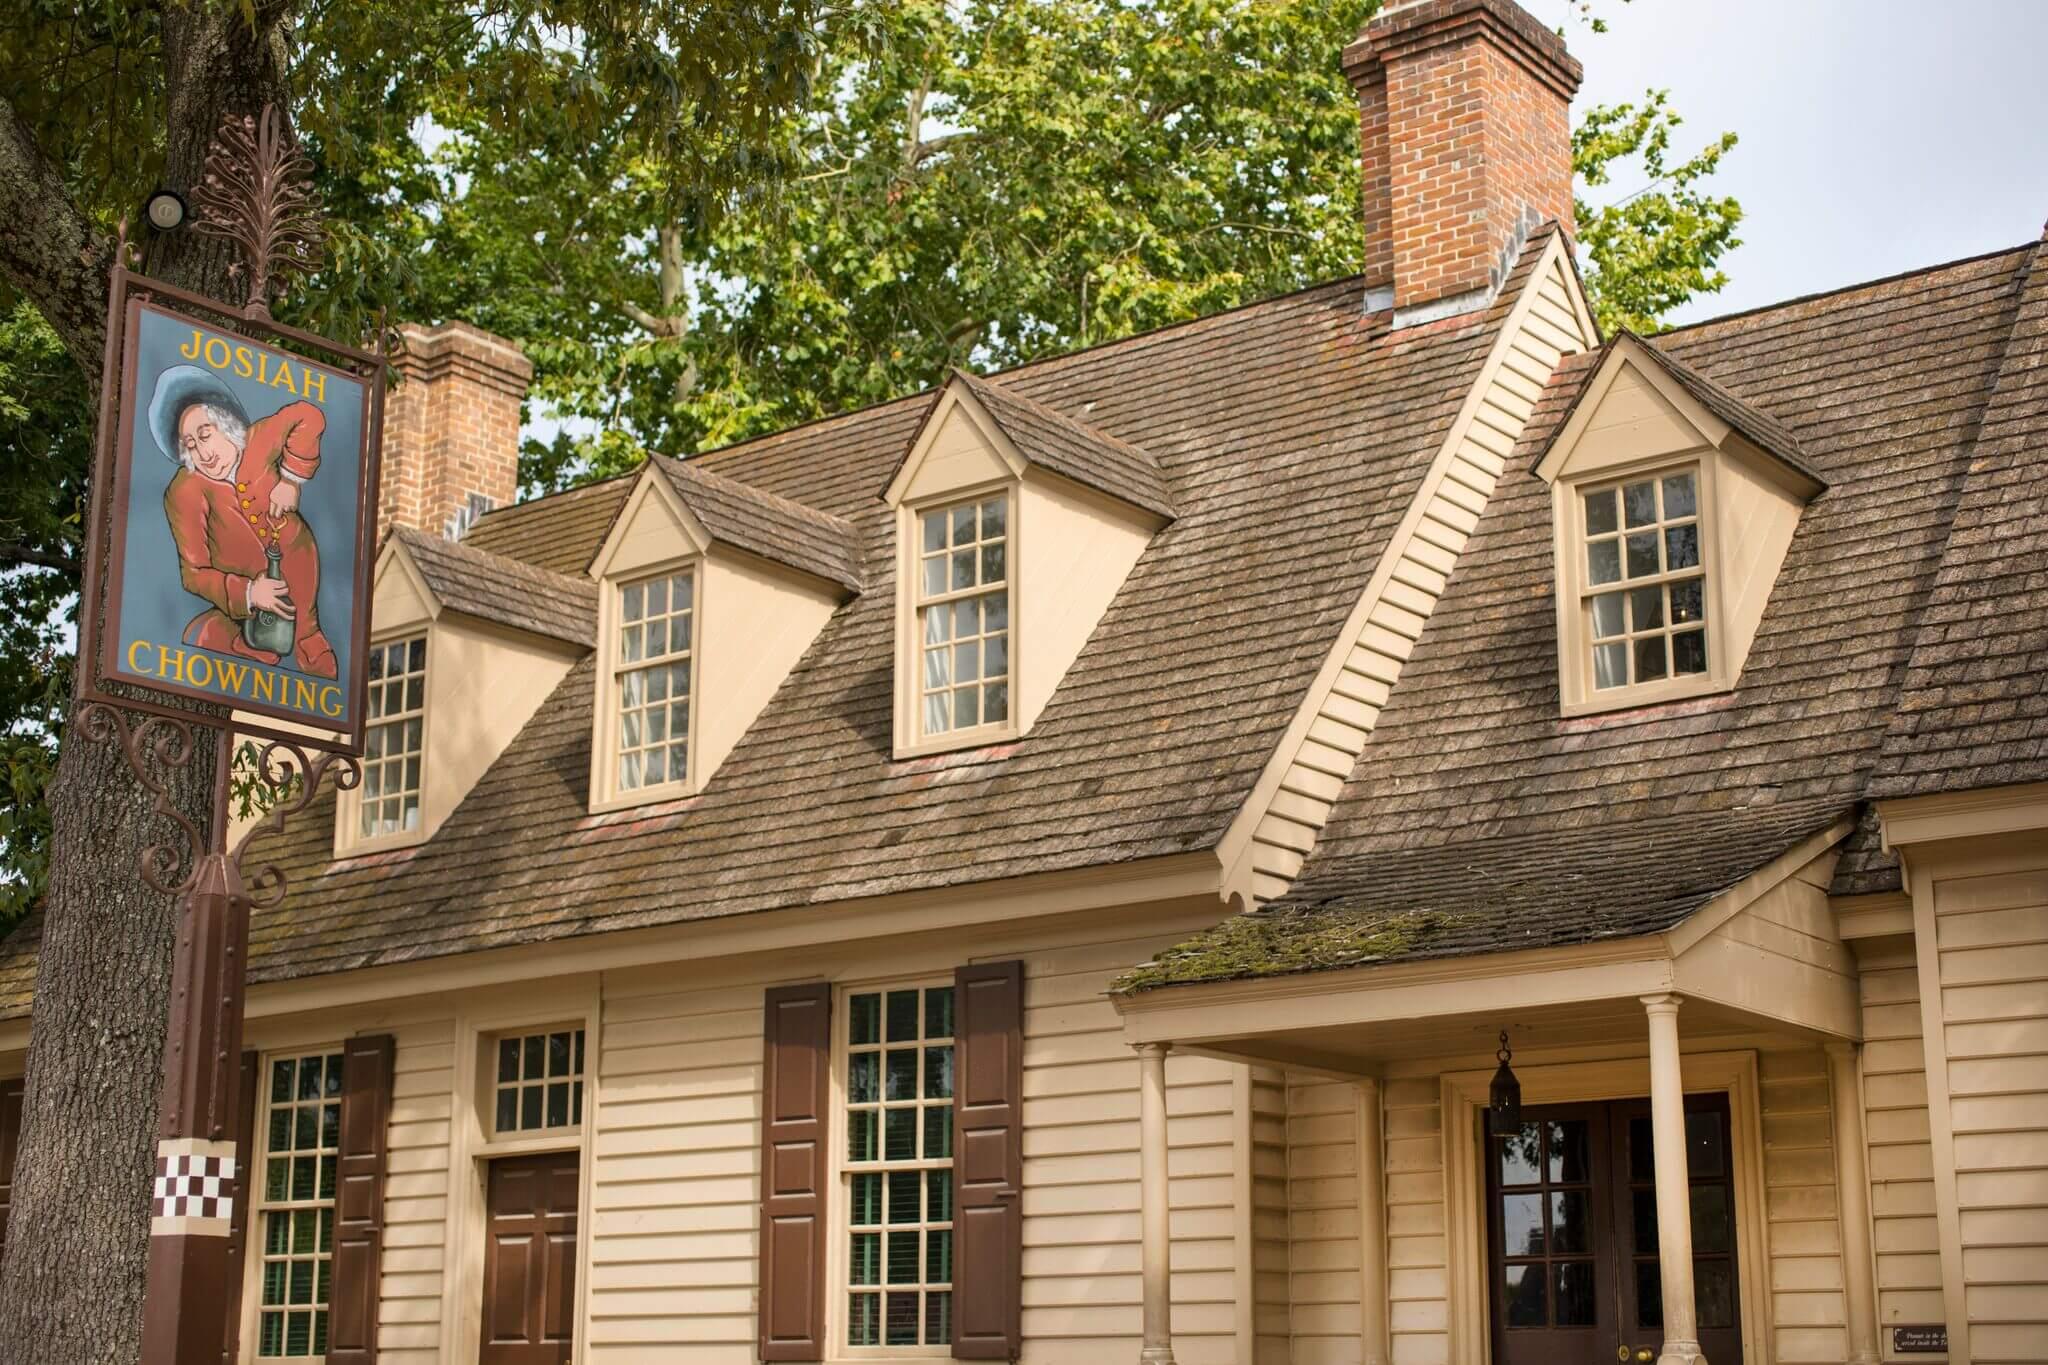 Chowning's Tavern | Colonial Williamsburg Resorts